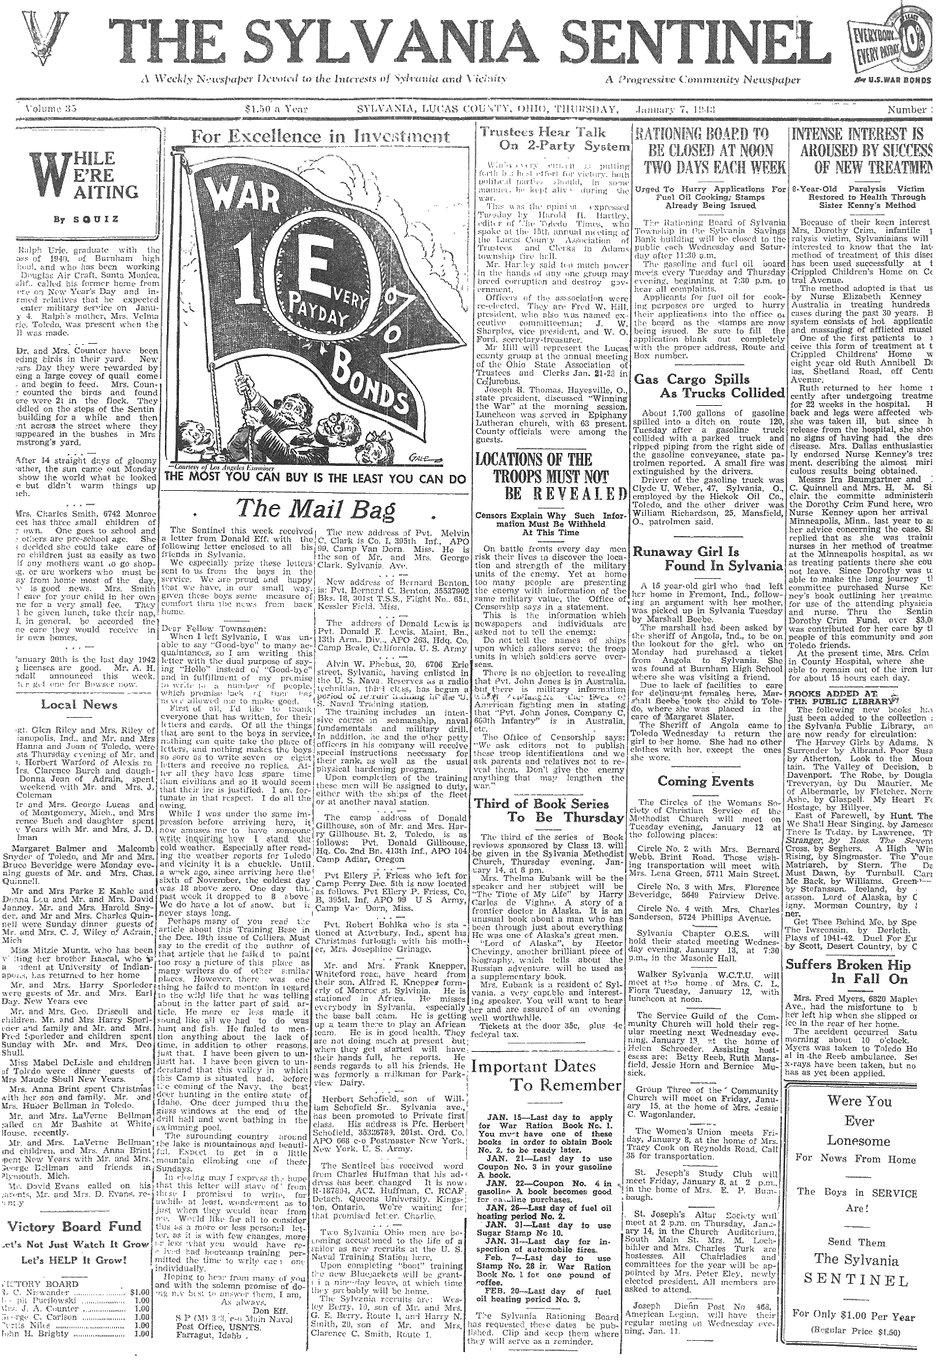 1943 jan 7 sylvania sentinel